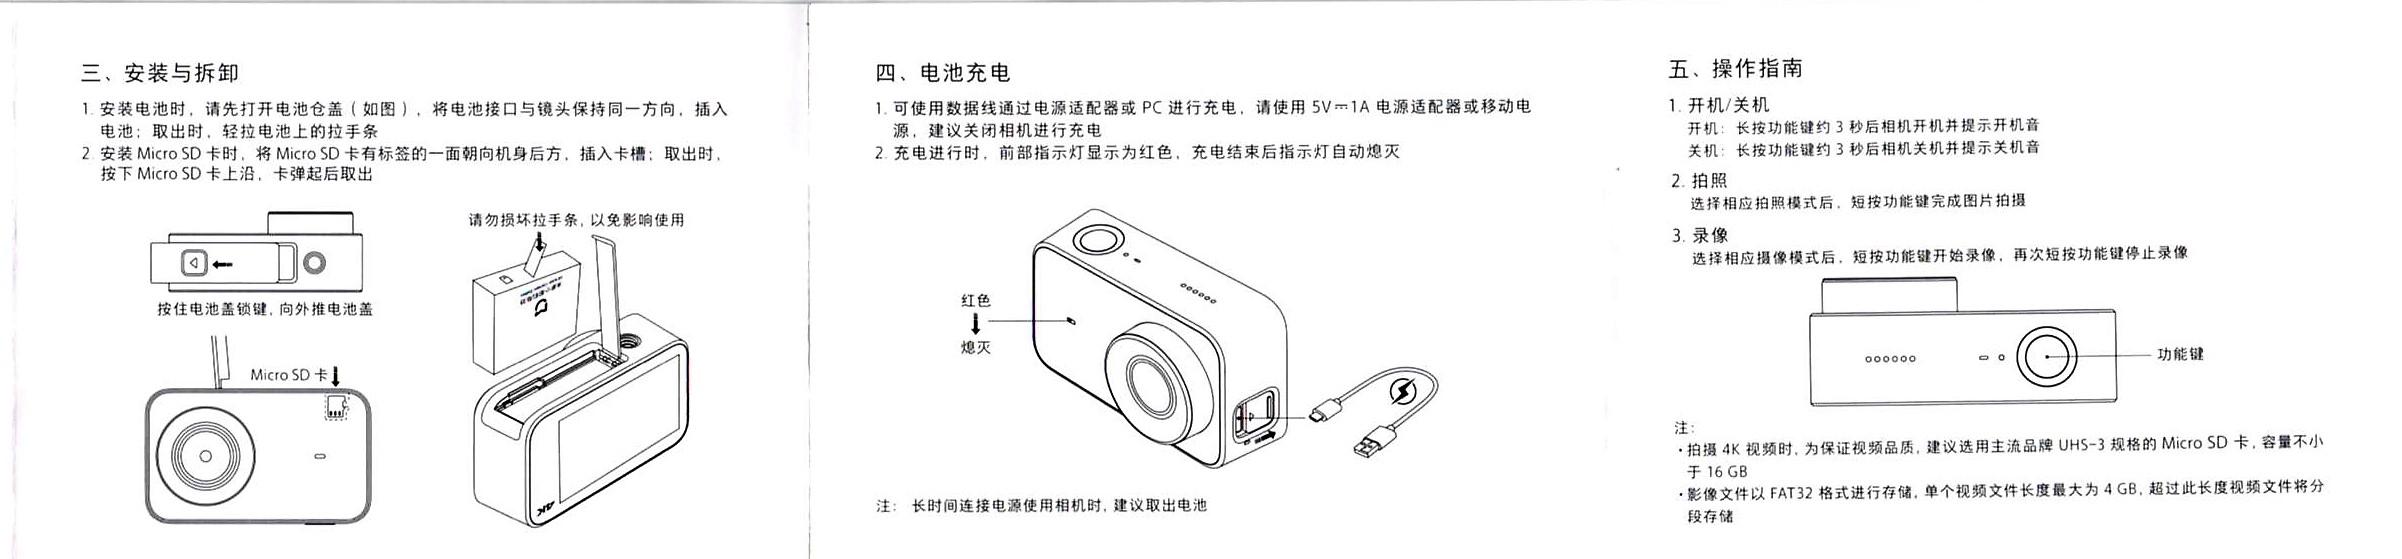 Xiaomi Mijia Camera Mini アクションカメラ 取説2